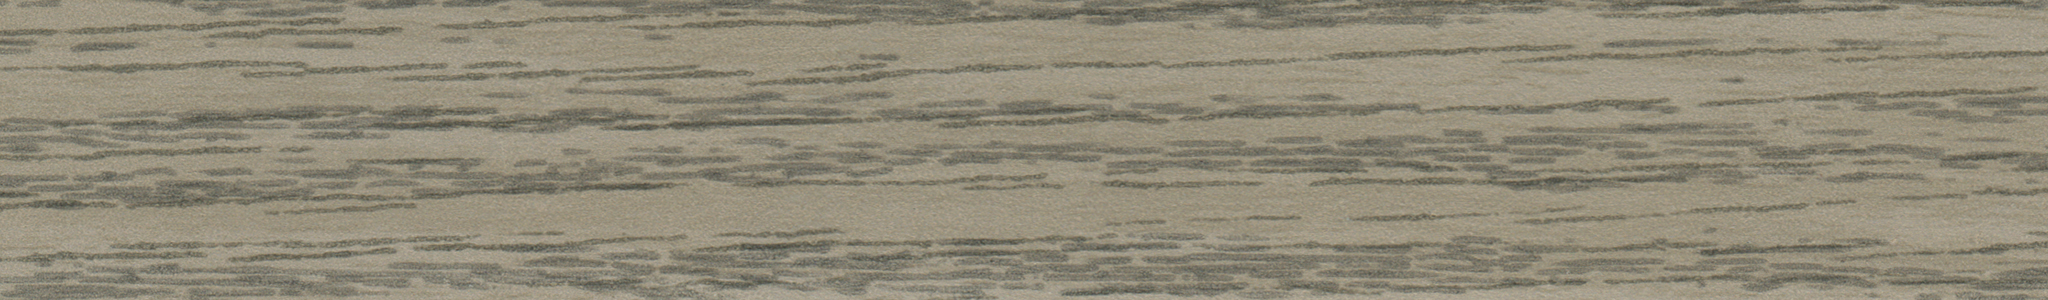 HD 248500 ABS Kante Dekor Eiche Salisbury perl